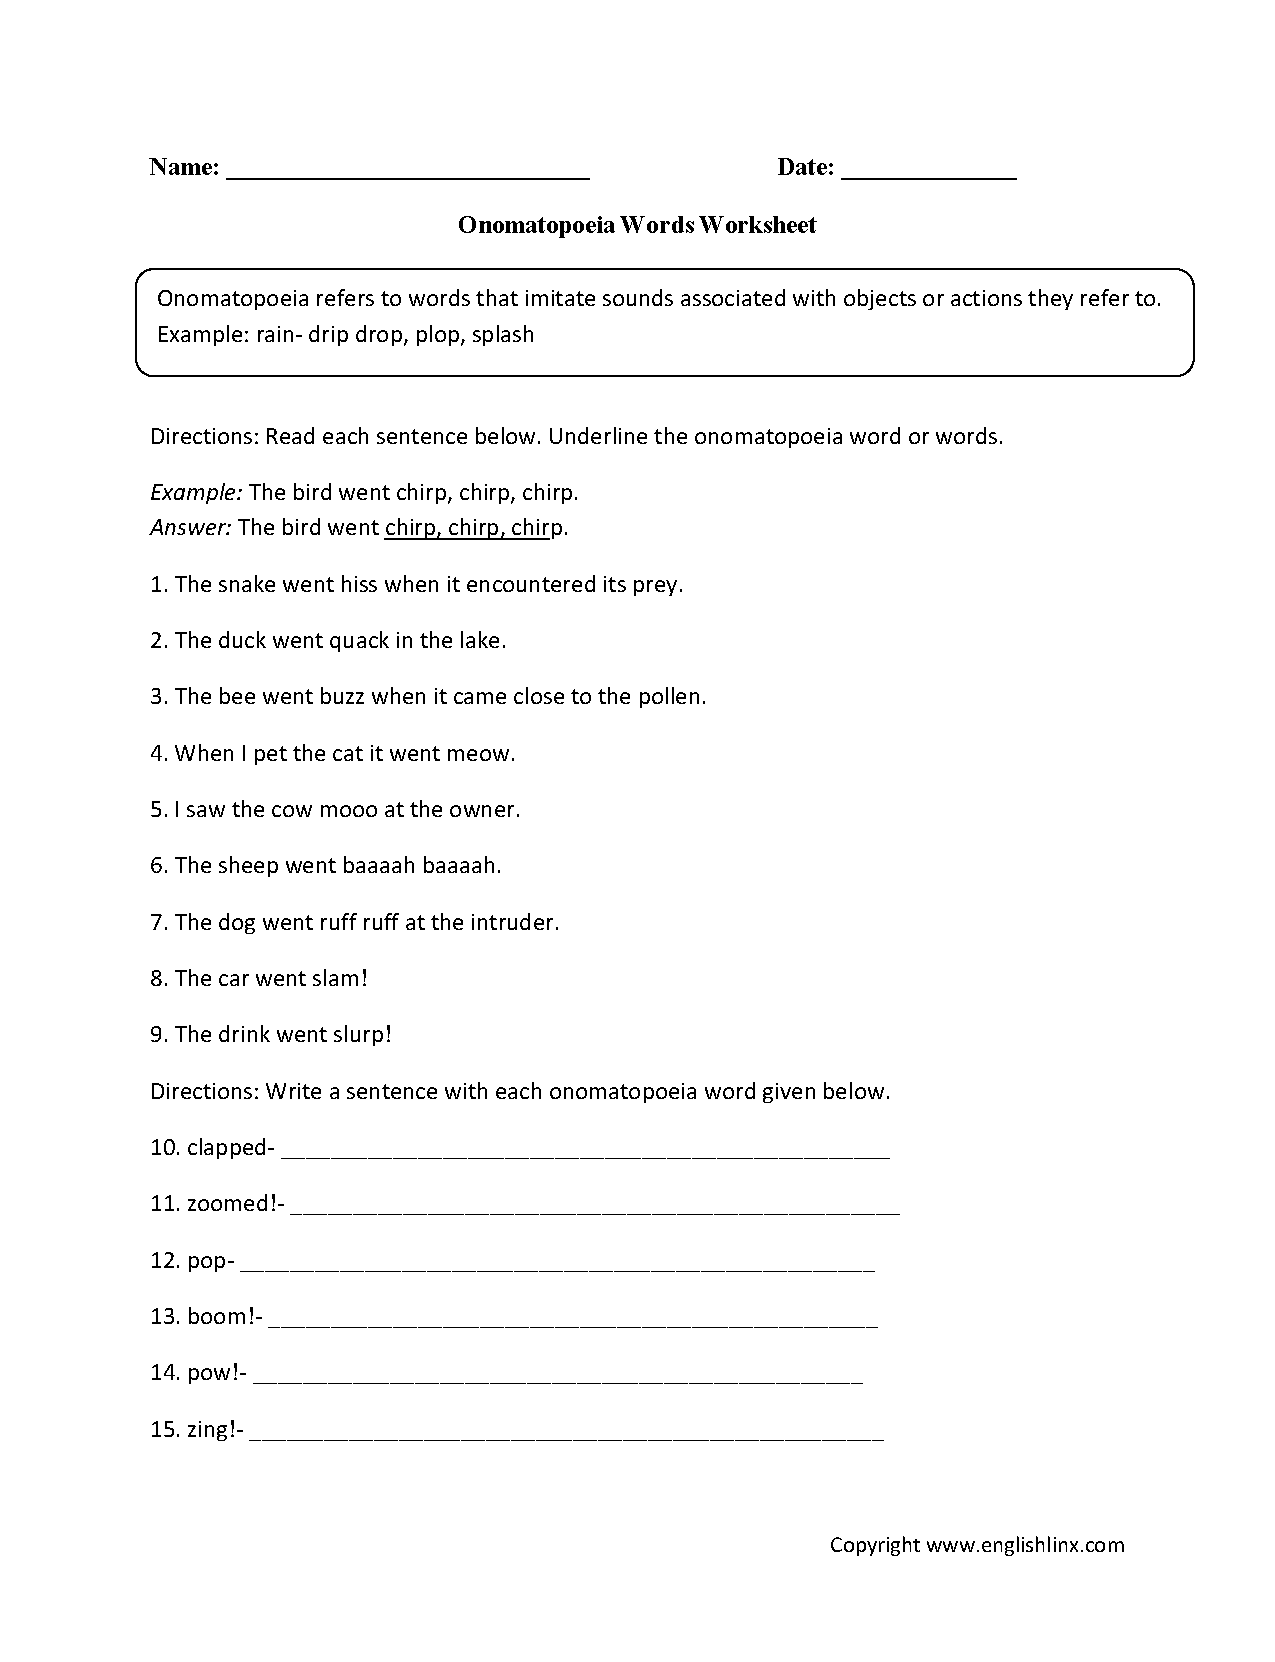 Onomatopoeia Words Worksheet